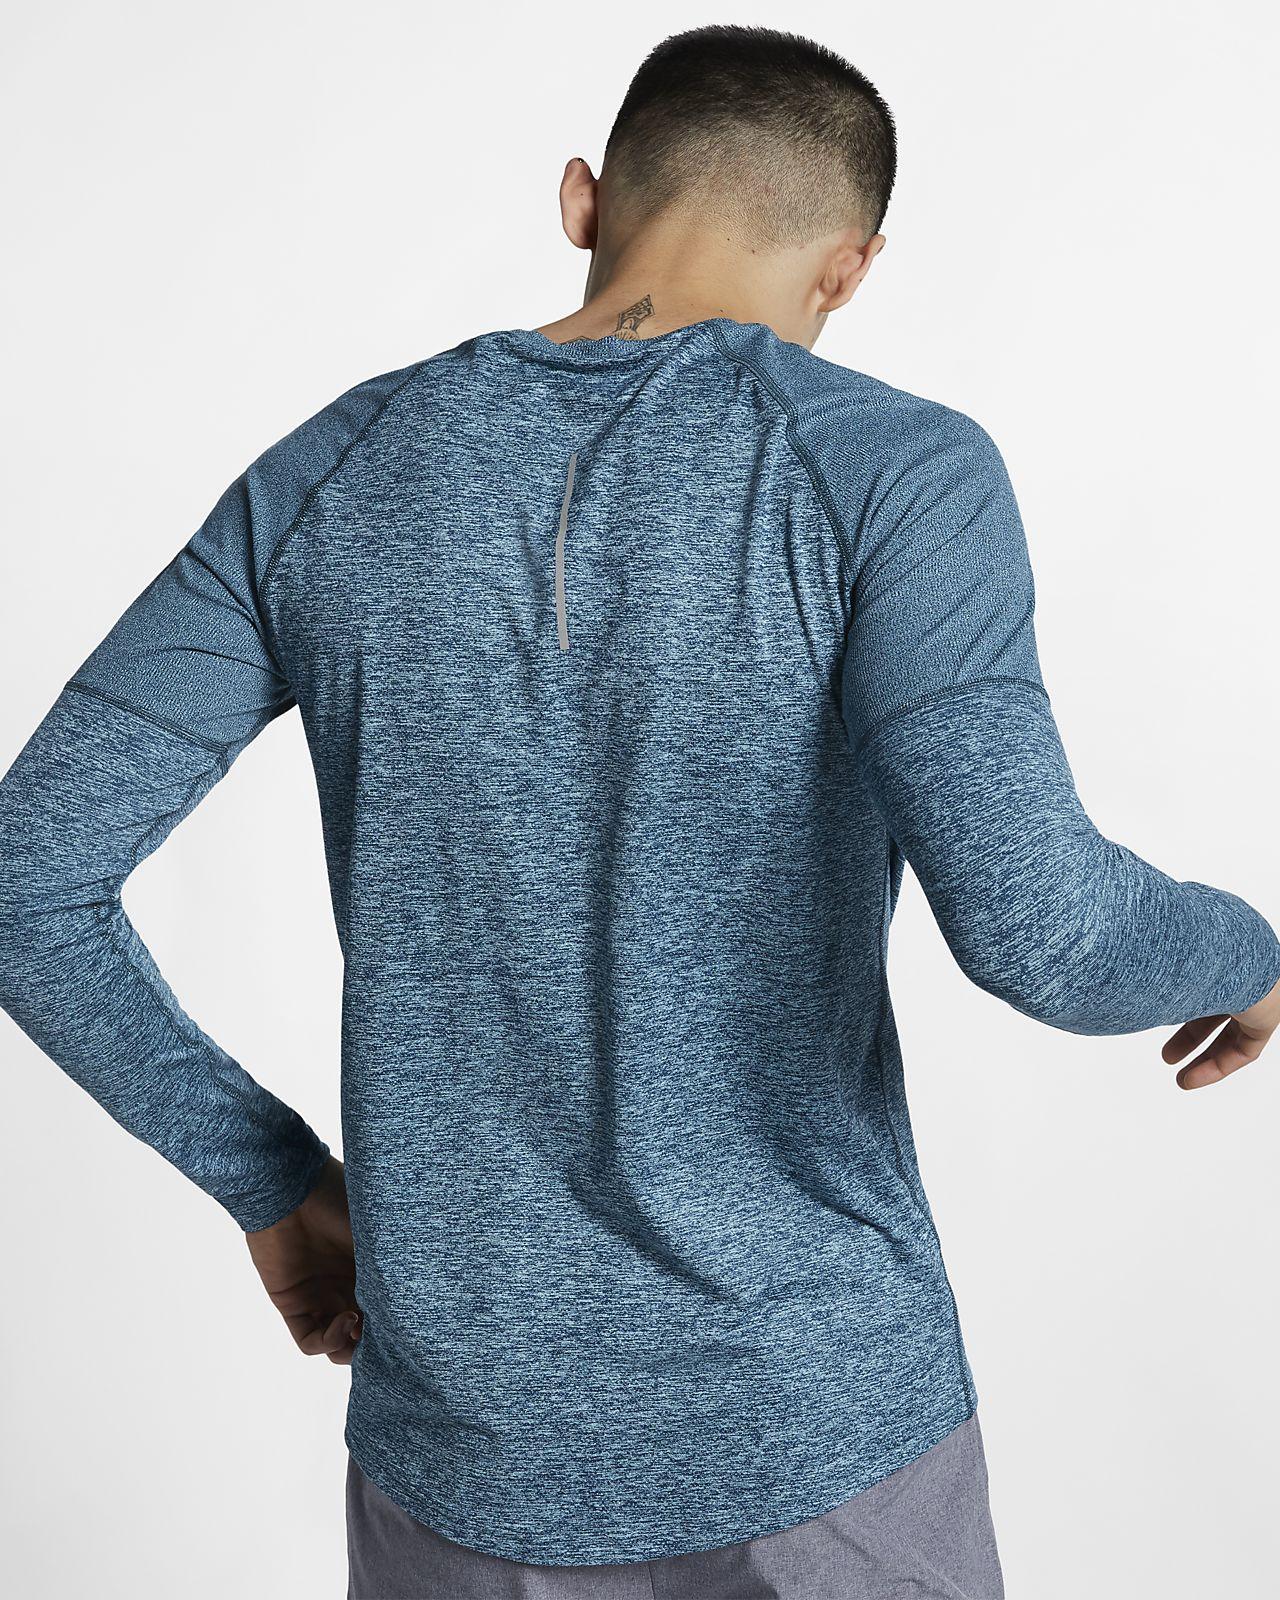 Details zu Nike Running Longsleeve Crew Jacket Herren Laufoberteil black Gr M SCHWARZ NEU